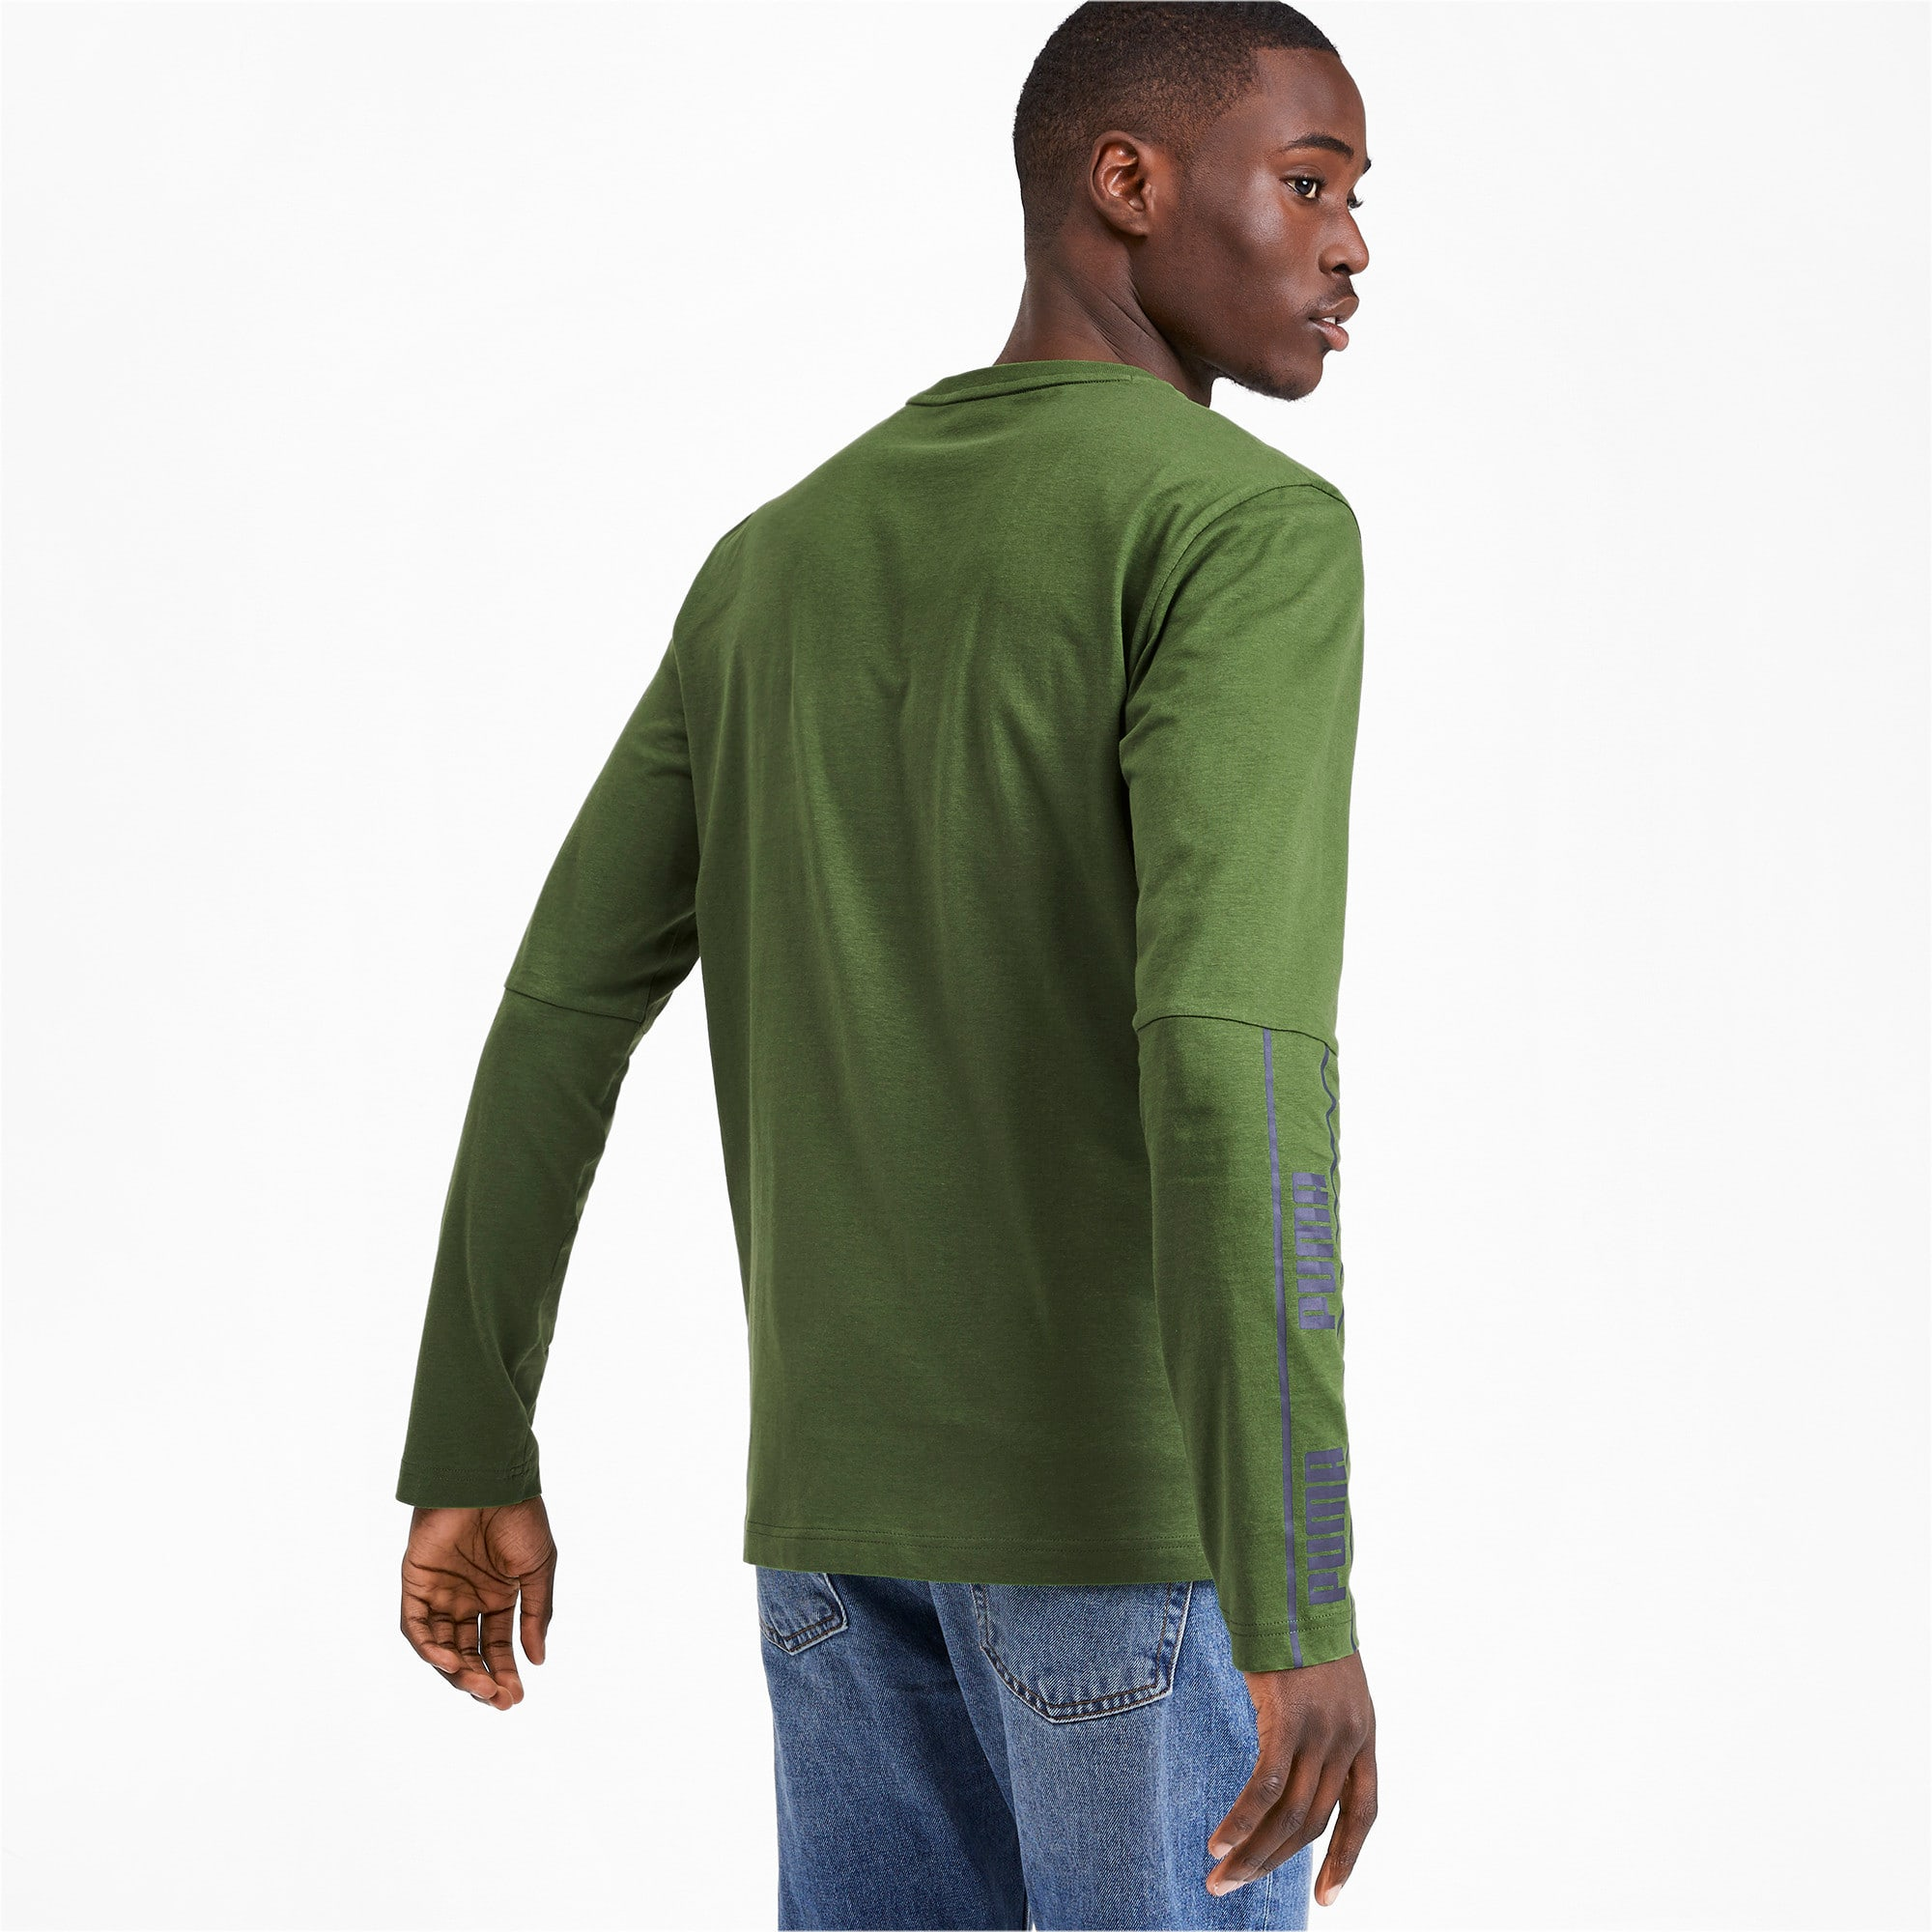 Thumbnail 2 of Amplified Long Sleeve Men's Tee, Garden Green, medium-IND